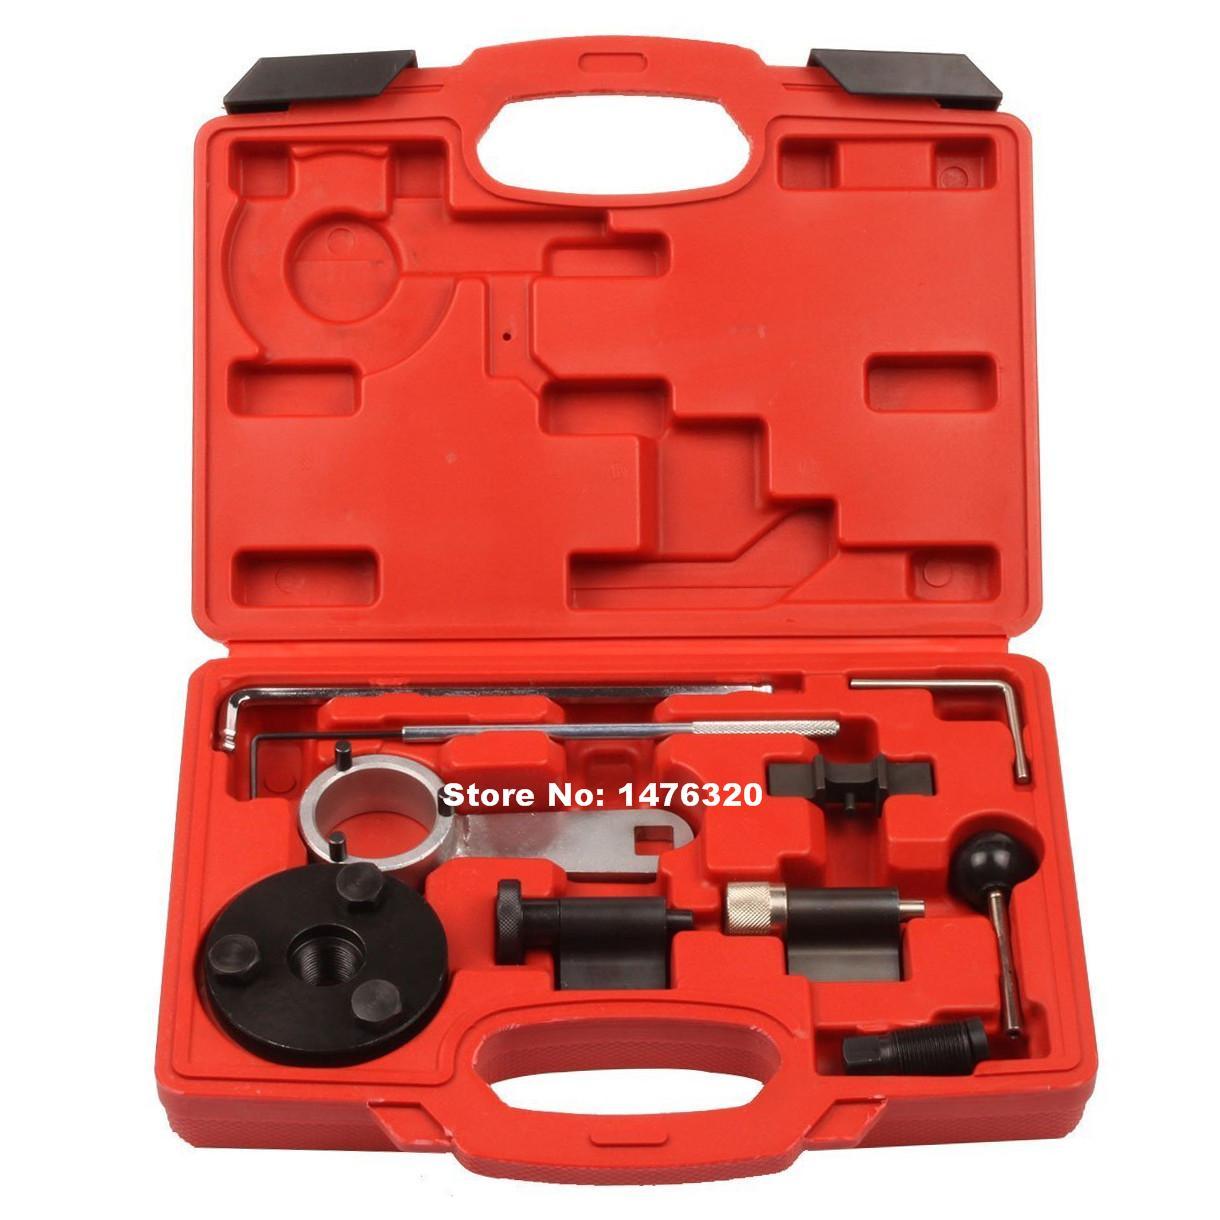 ФОТО Automotive Engine Timing Camshaft Locking Setting Tool Kit For Audi Skoda Seat VW VAG 1.6 & 2.0L TDI AT2196